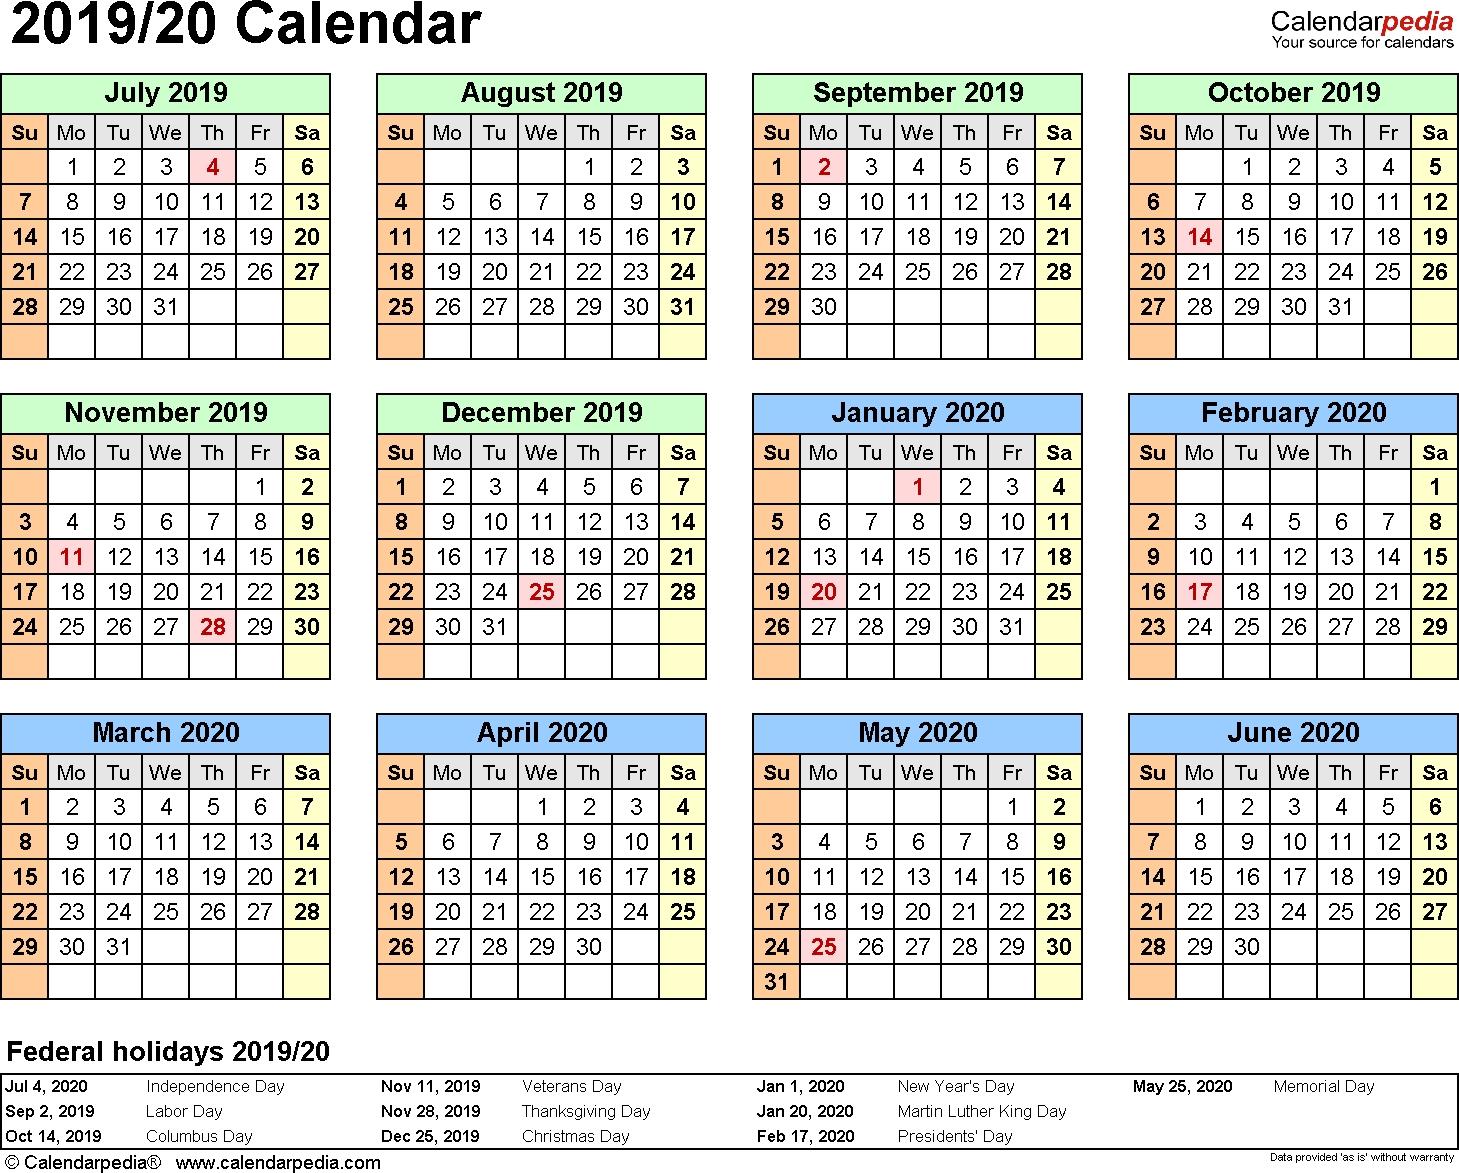 Split Year Calendars 2019/2020 (July To June) - Pdf Templates inside Financial Week Calendar 2019 2020